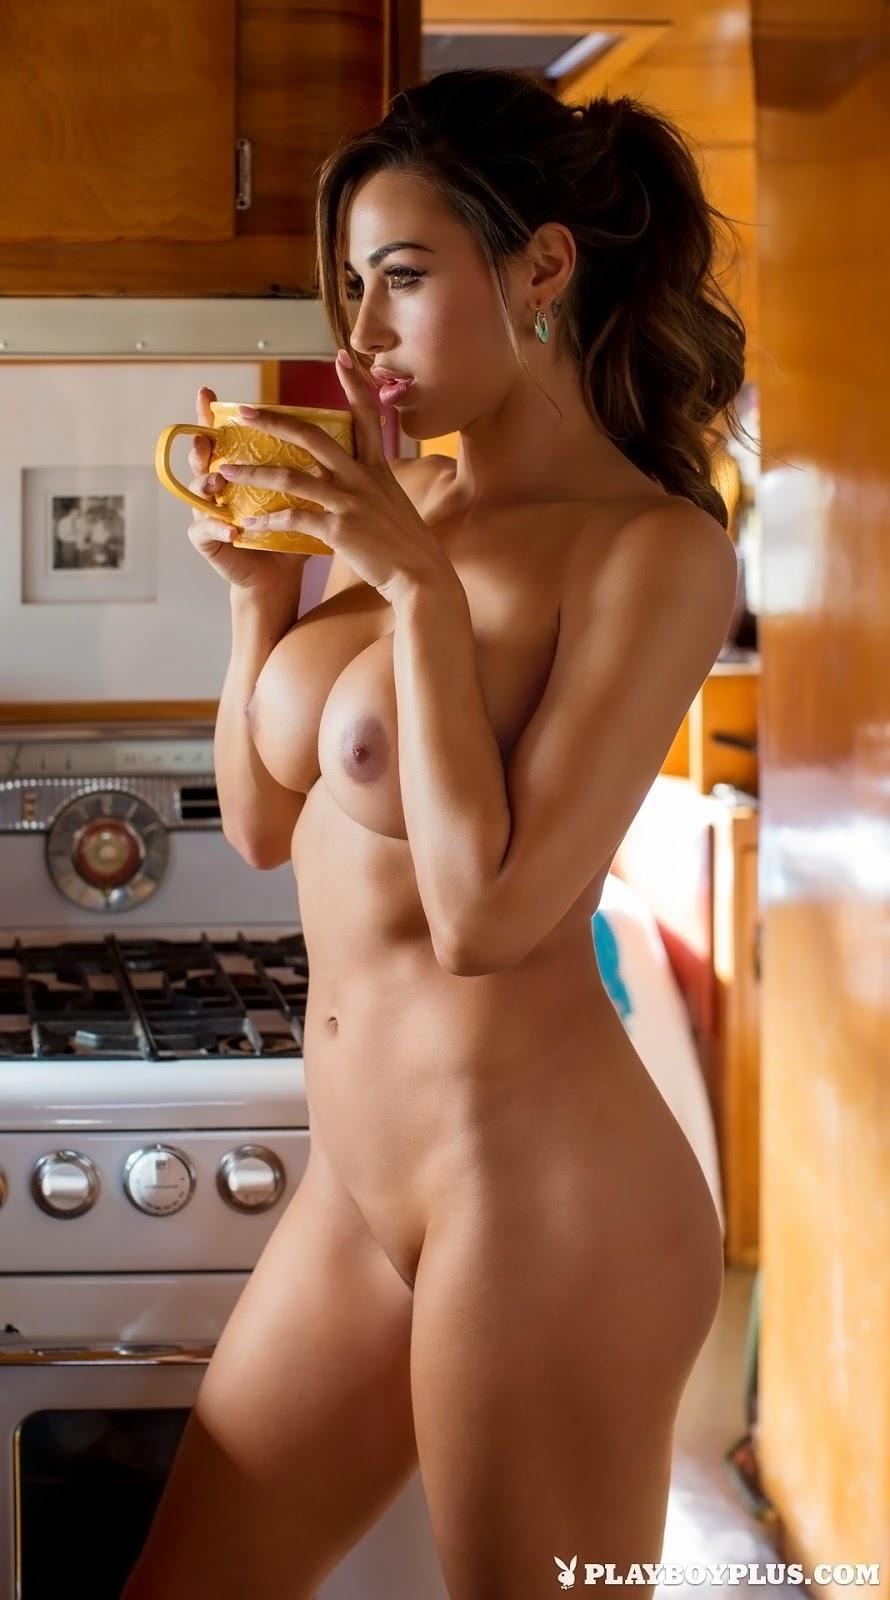 Ana Cheri for Playboy plus